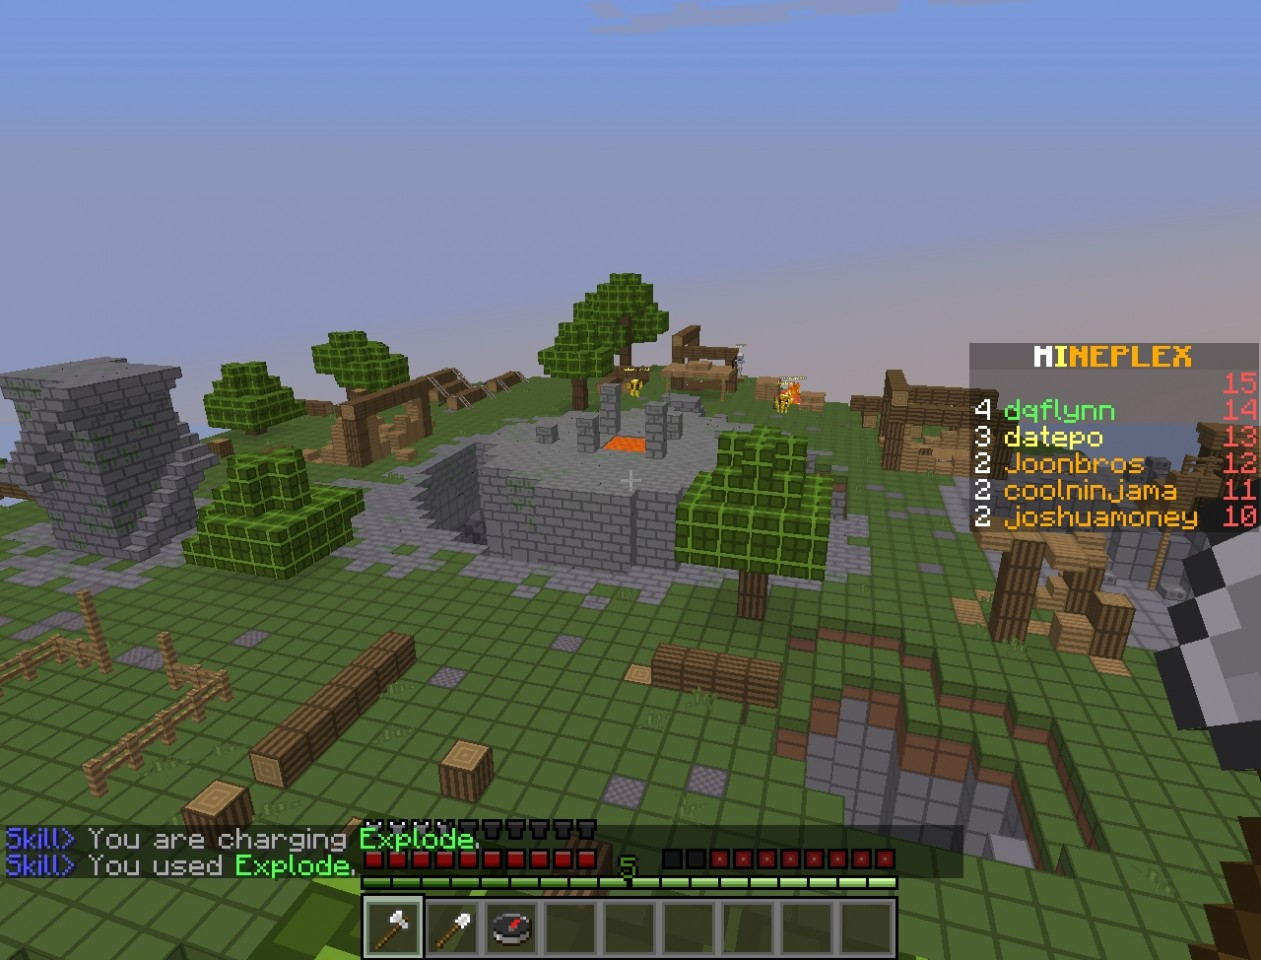 mineplex skylands map